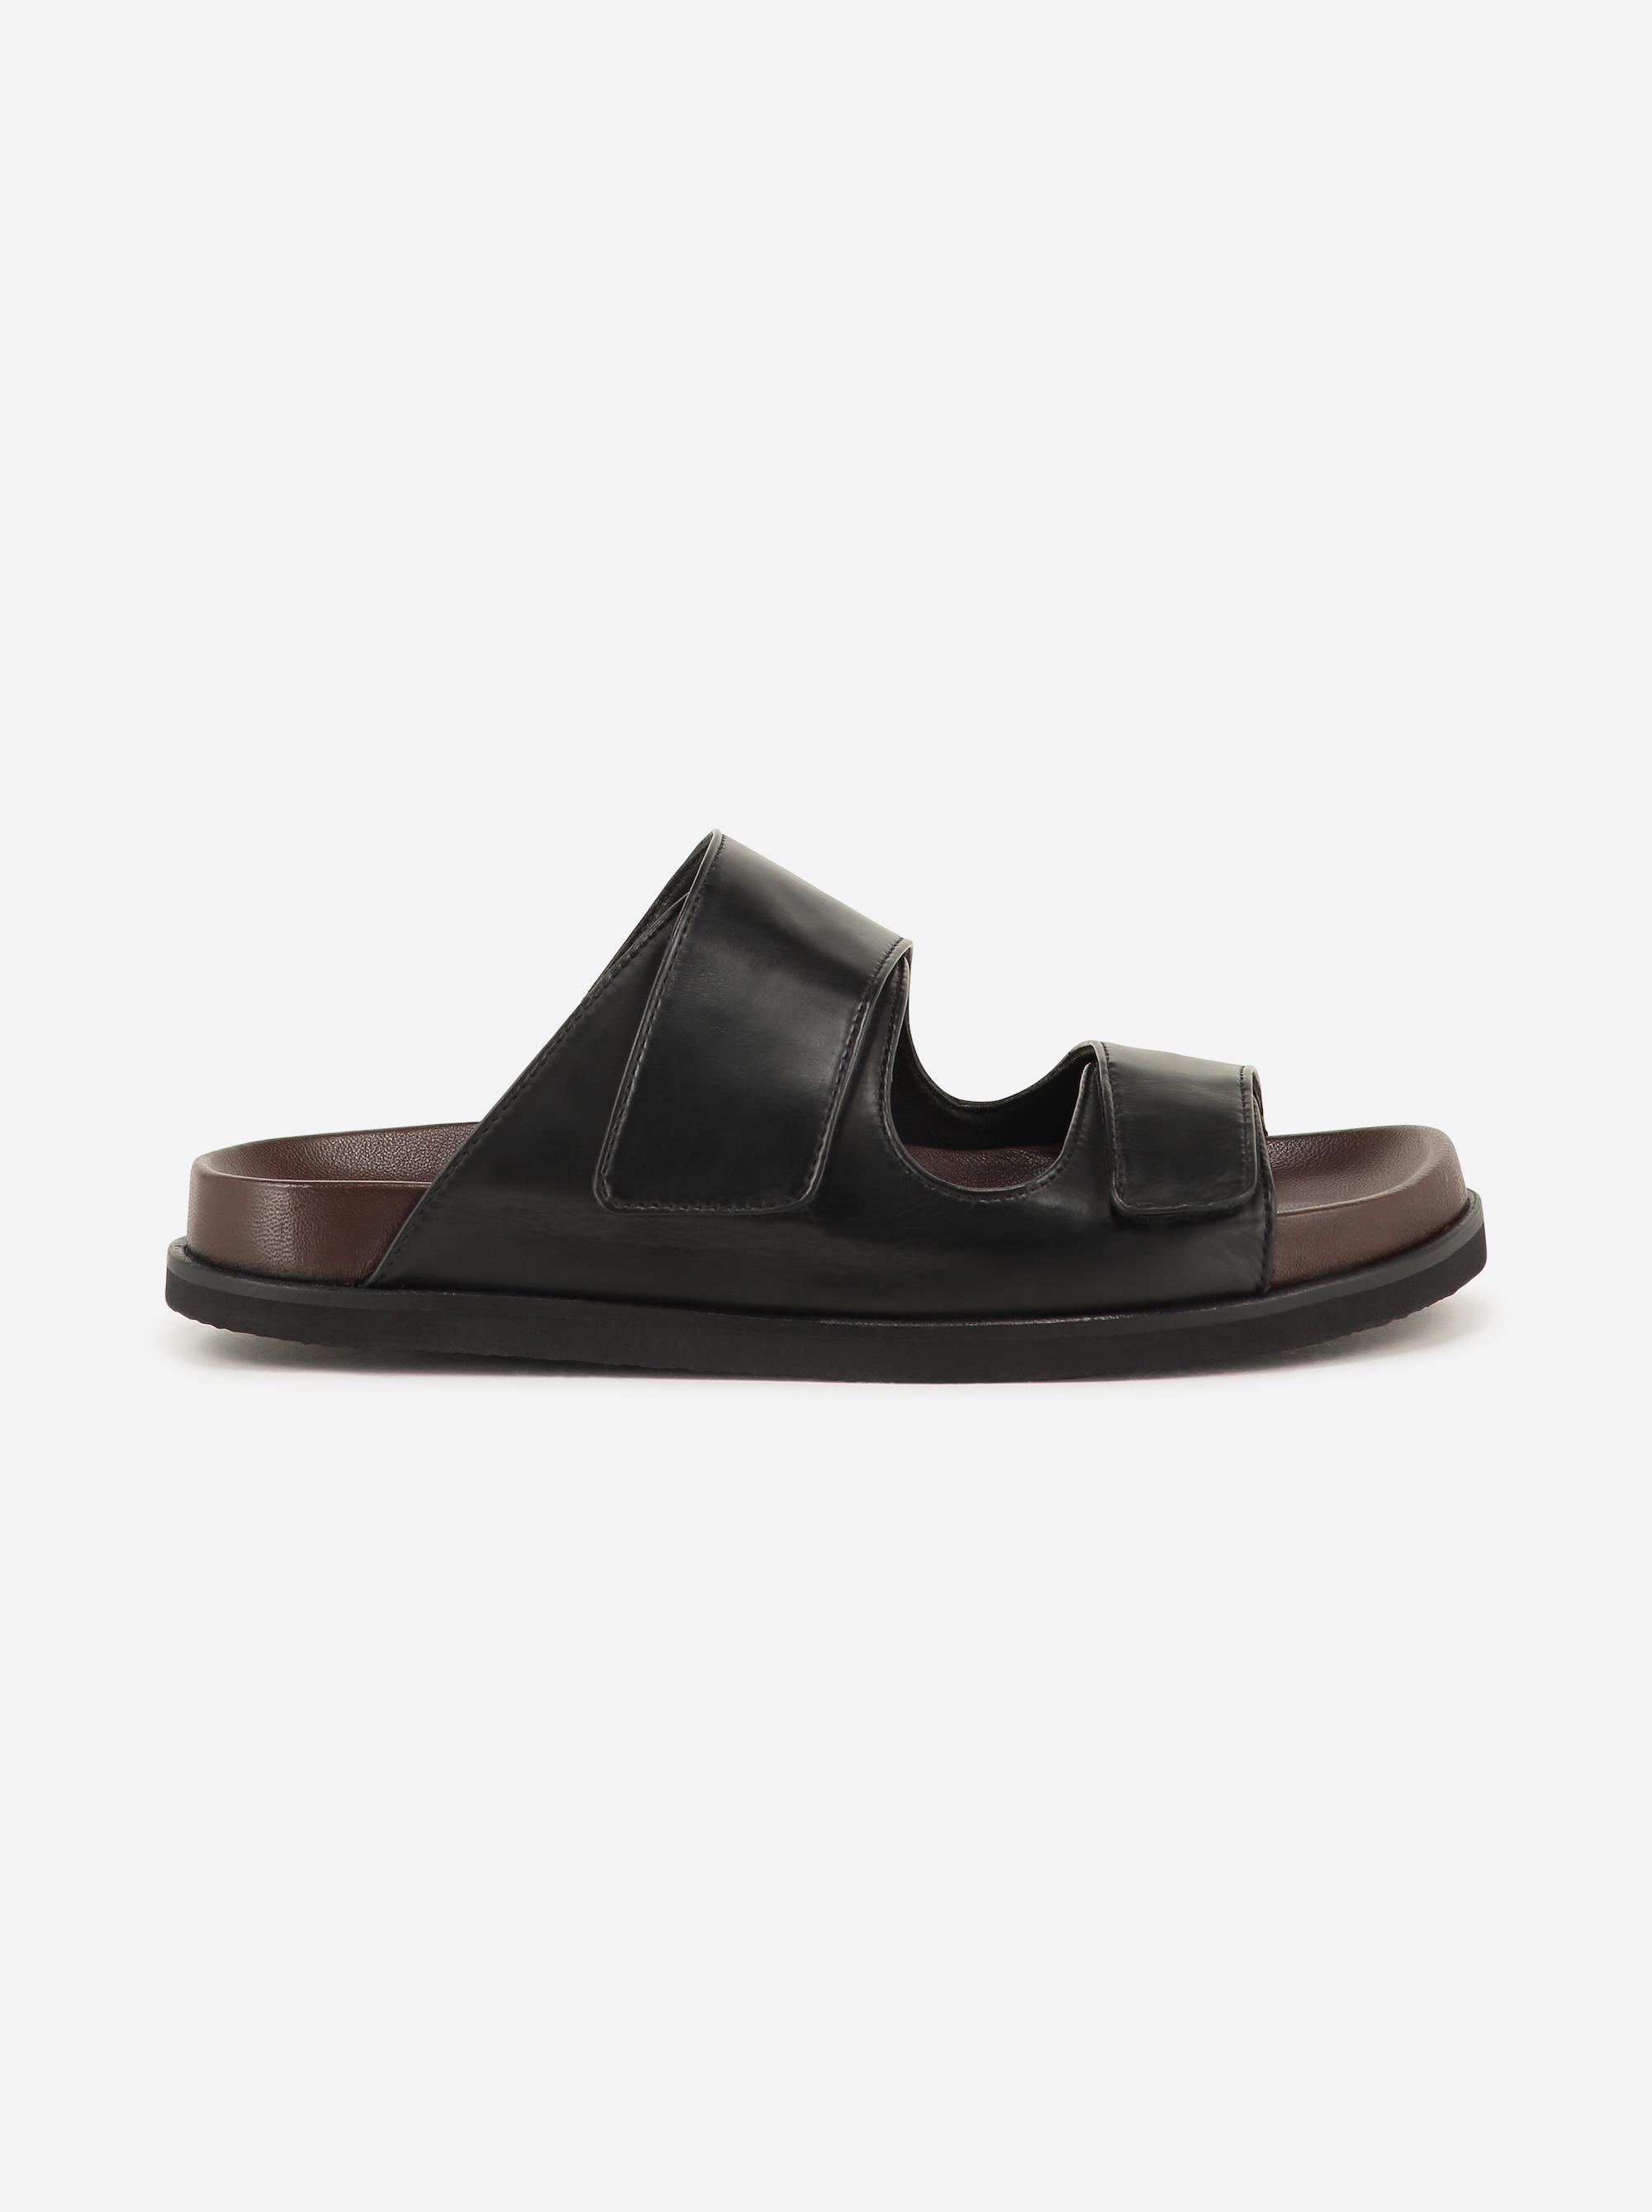 Teym - The Sandal - Black - 2b